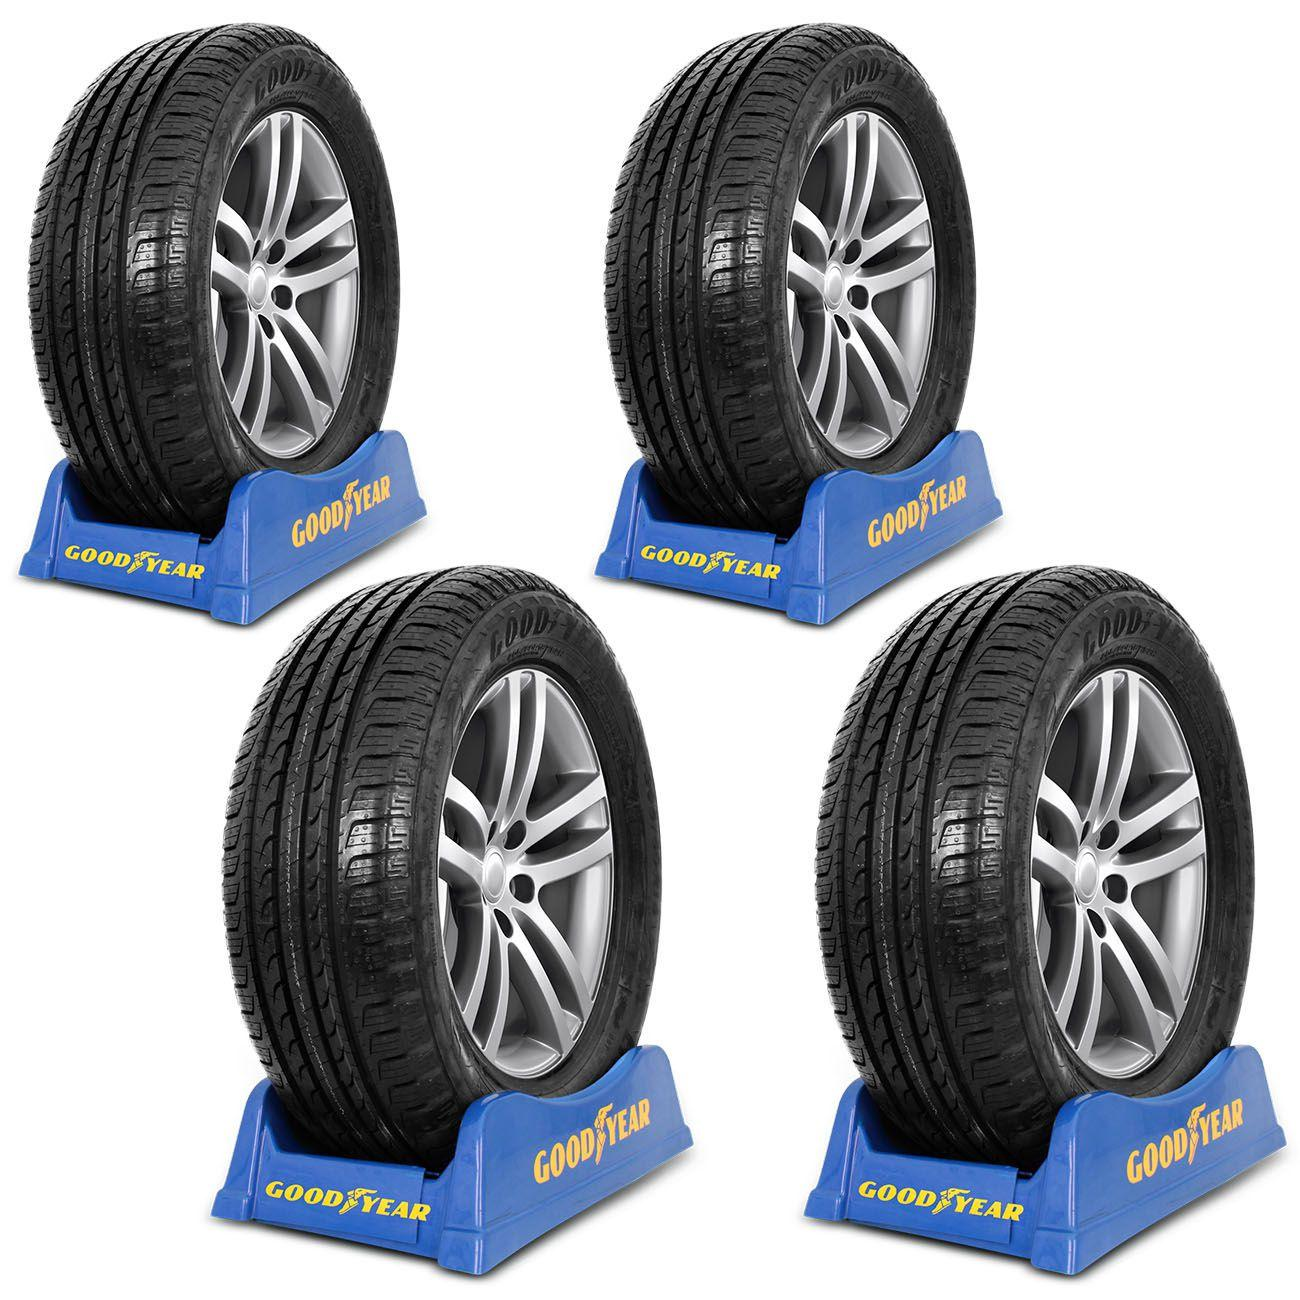 kit 4 unidades pneu aro 16 goodyear efficientgrip suv 205 60 r16 92h pneus carros aro 16. Black Bedroom Furniture Sets. Home Design Ideas